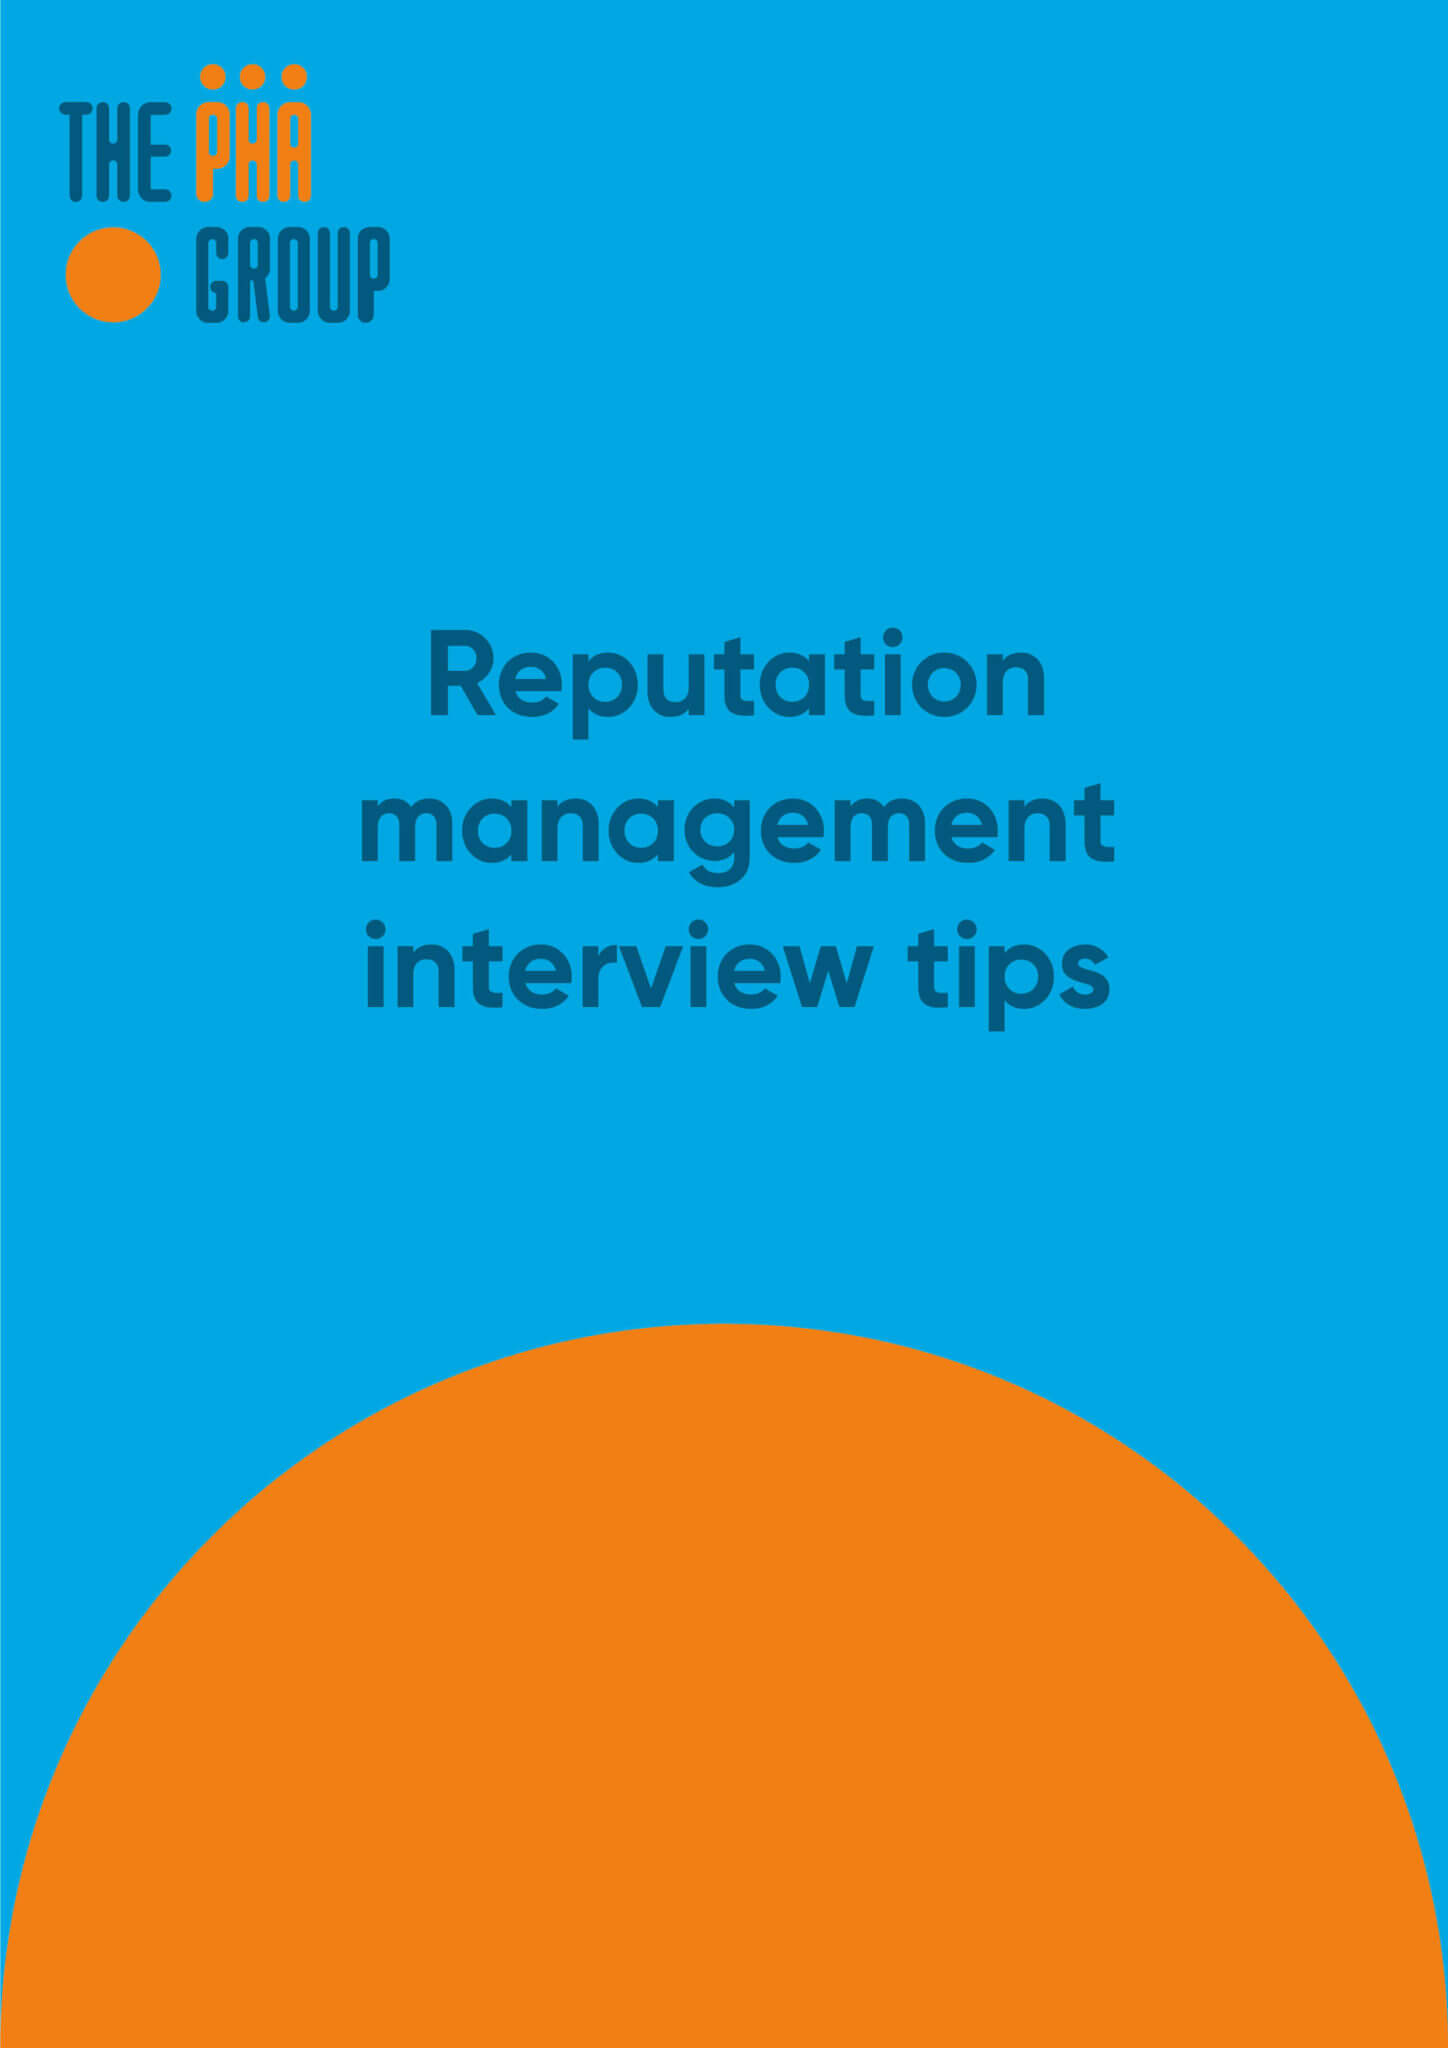 Reputation management interview tips